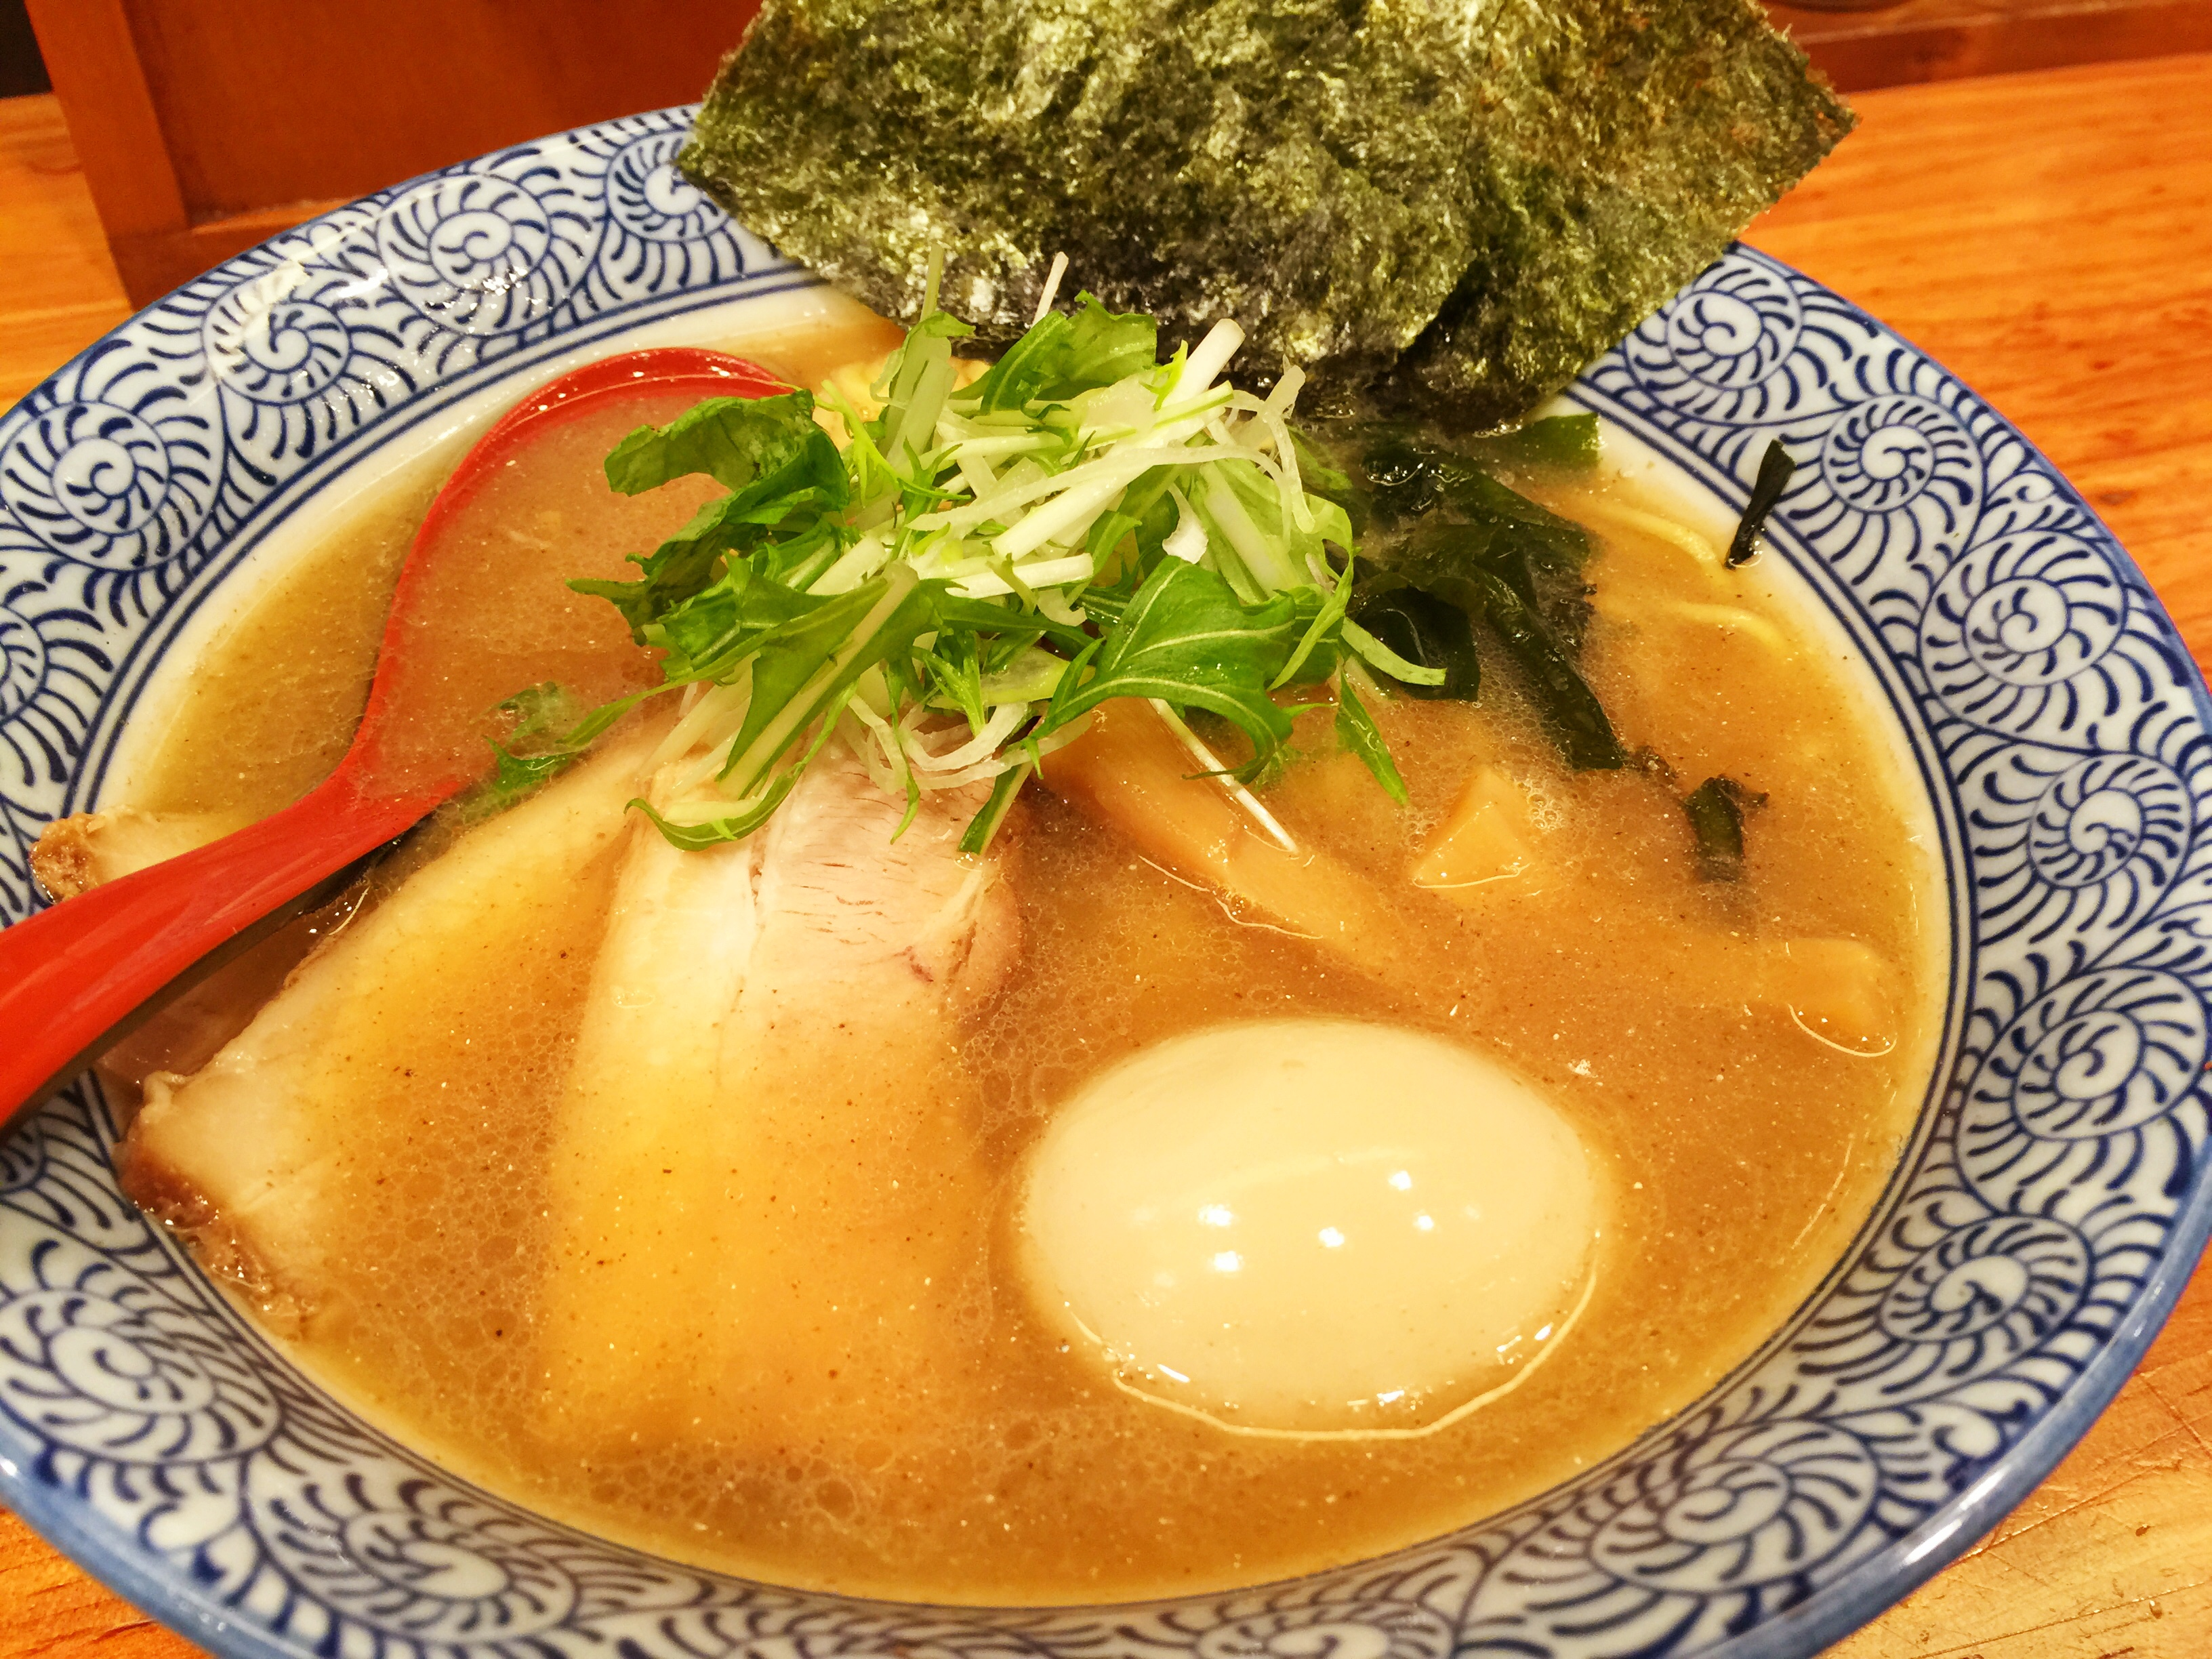 赤坂麺処友 (Tomo)